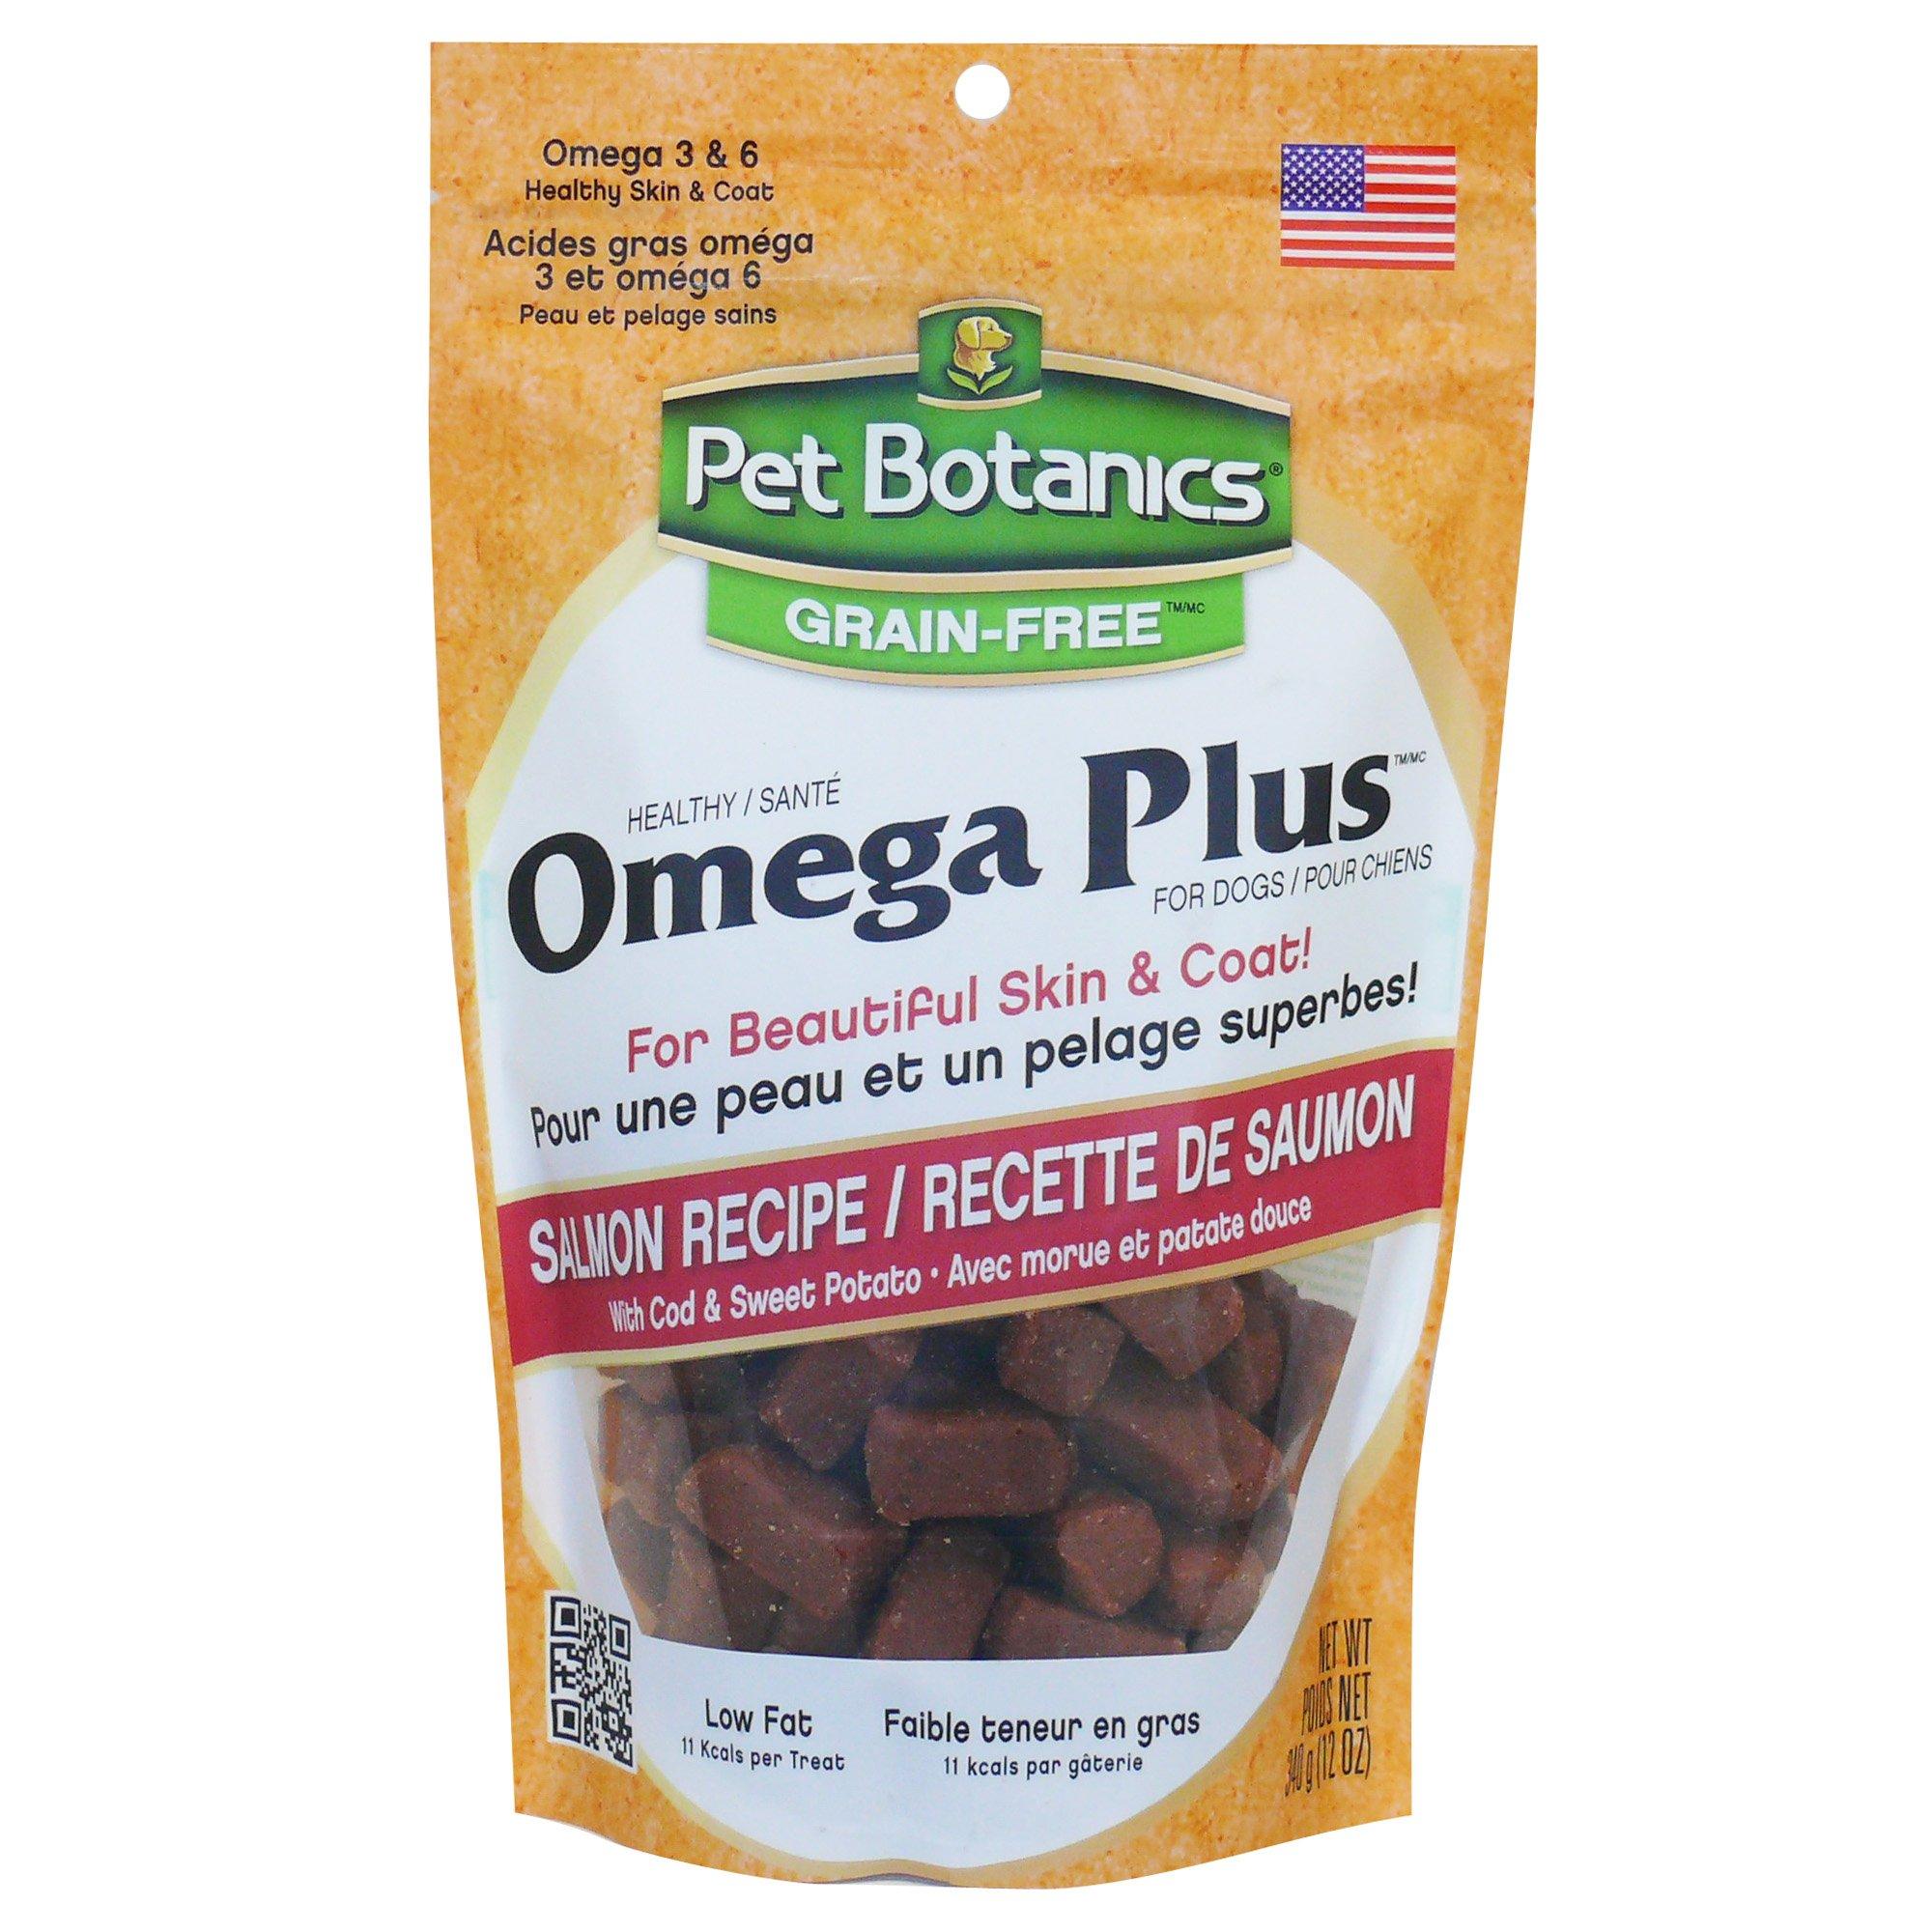 Pet Botanics Dog Food